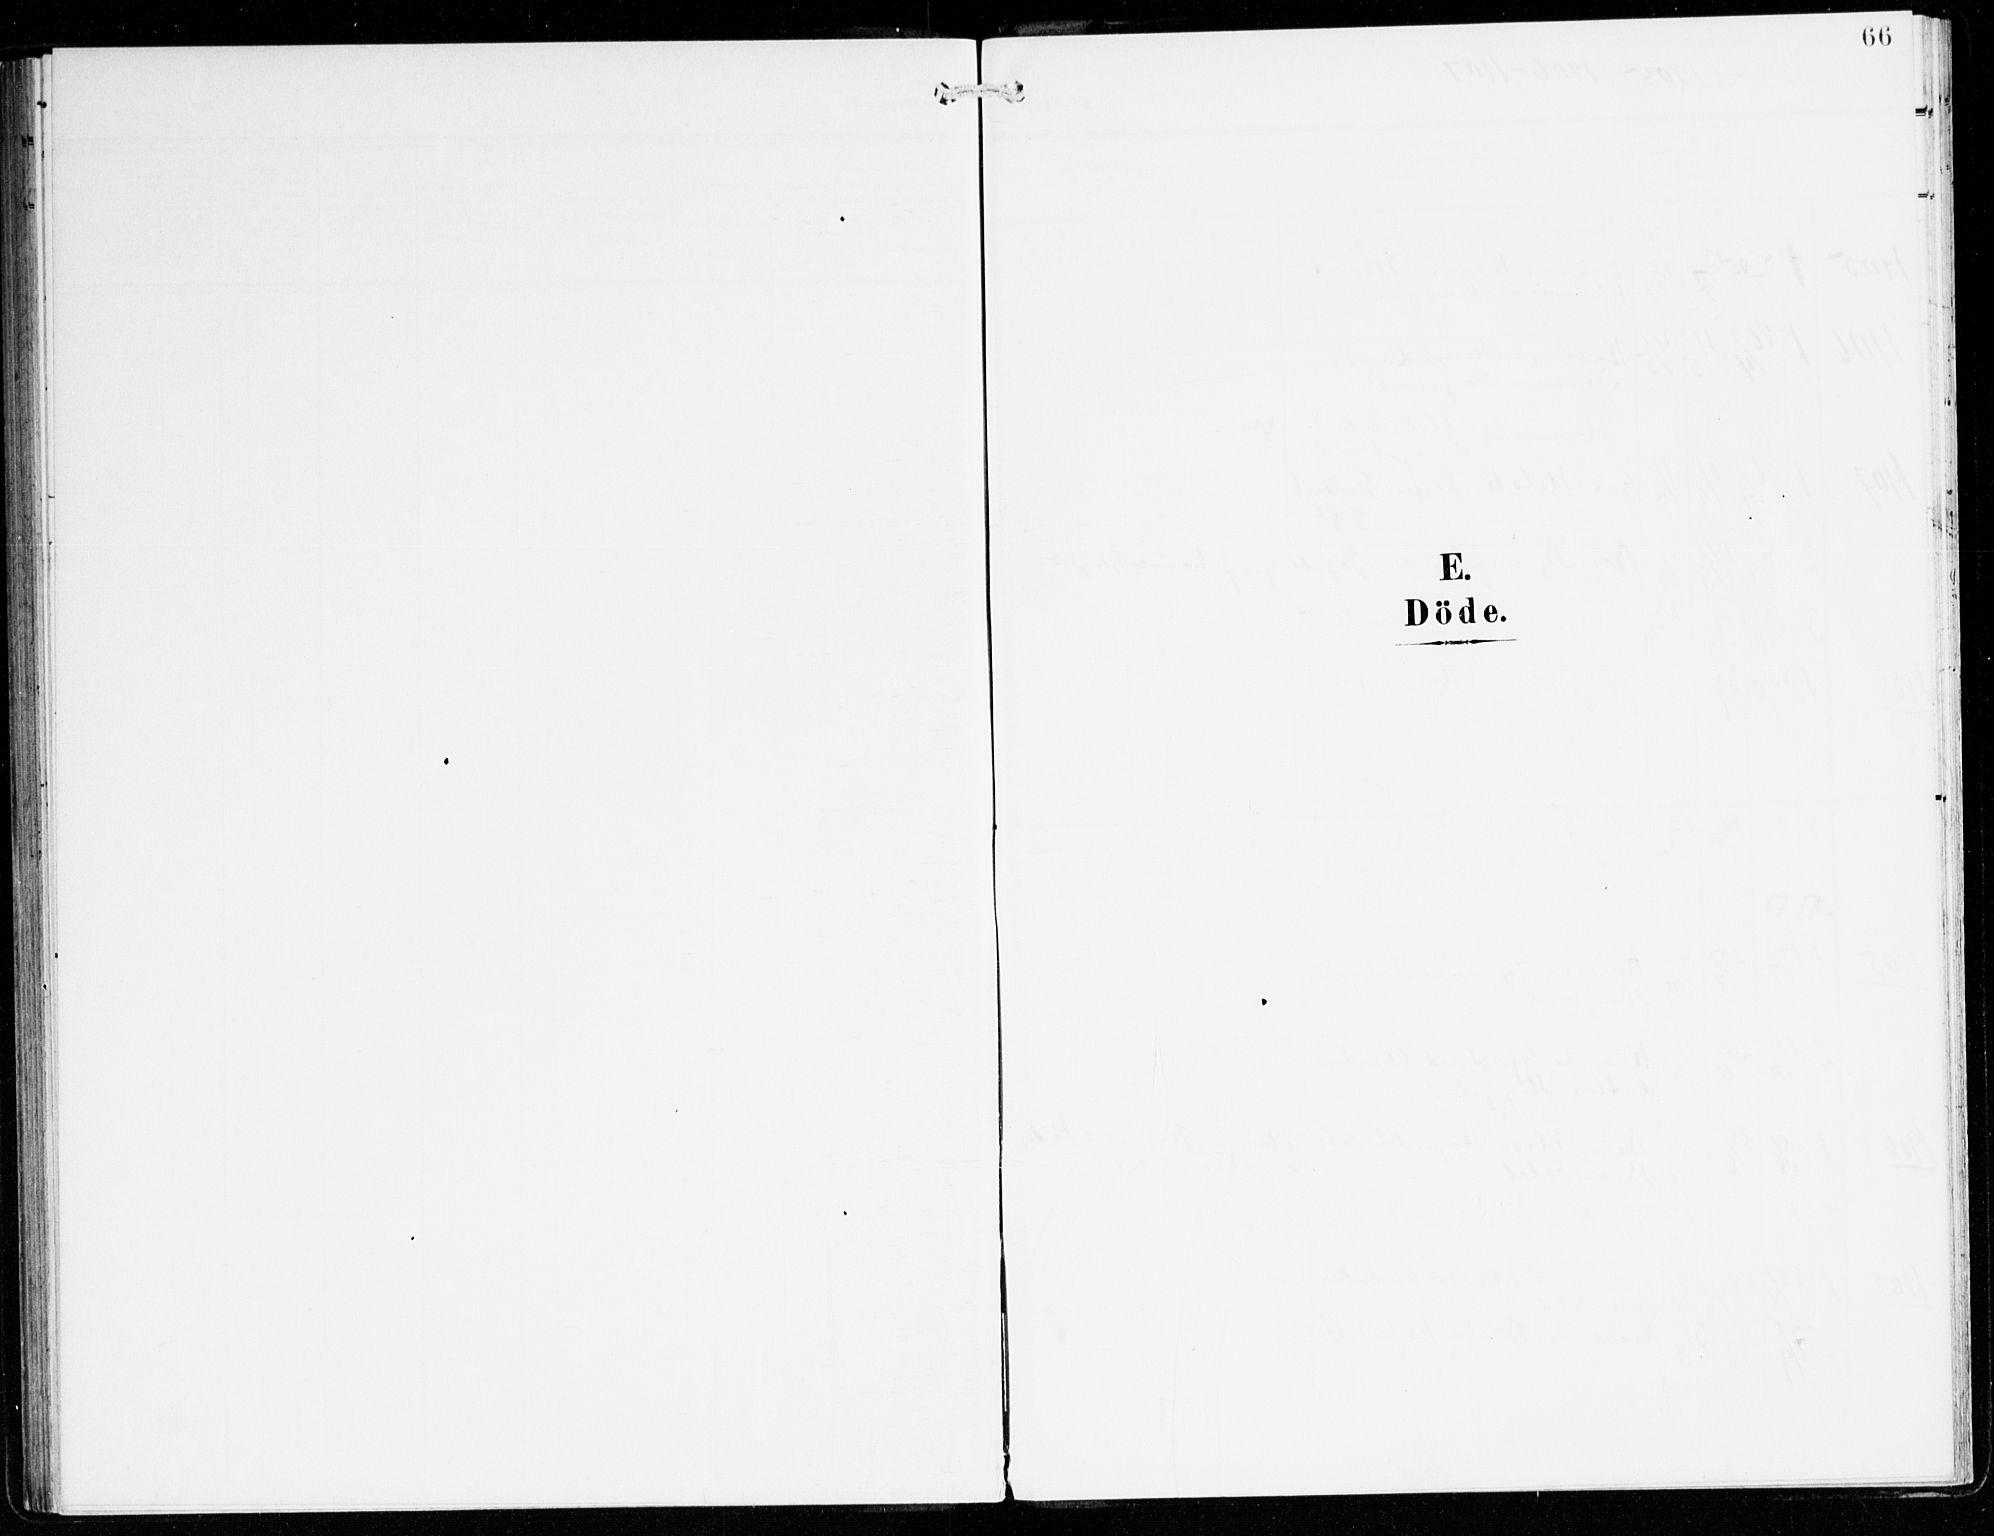 SAB, Hyllestad Sokneprestembete, Ministerialbok nr. C 2, 1904-1917, s. 66